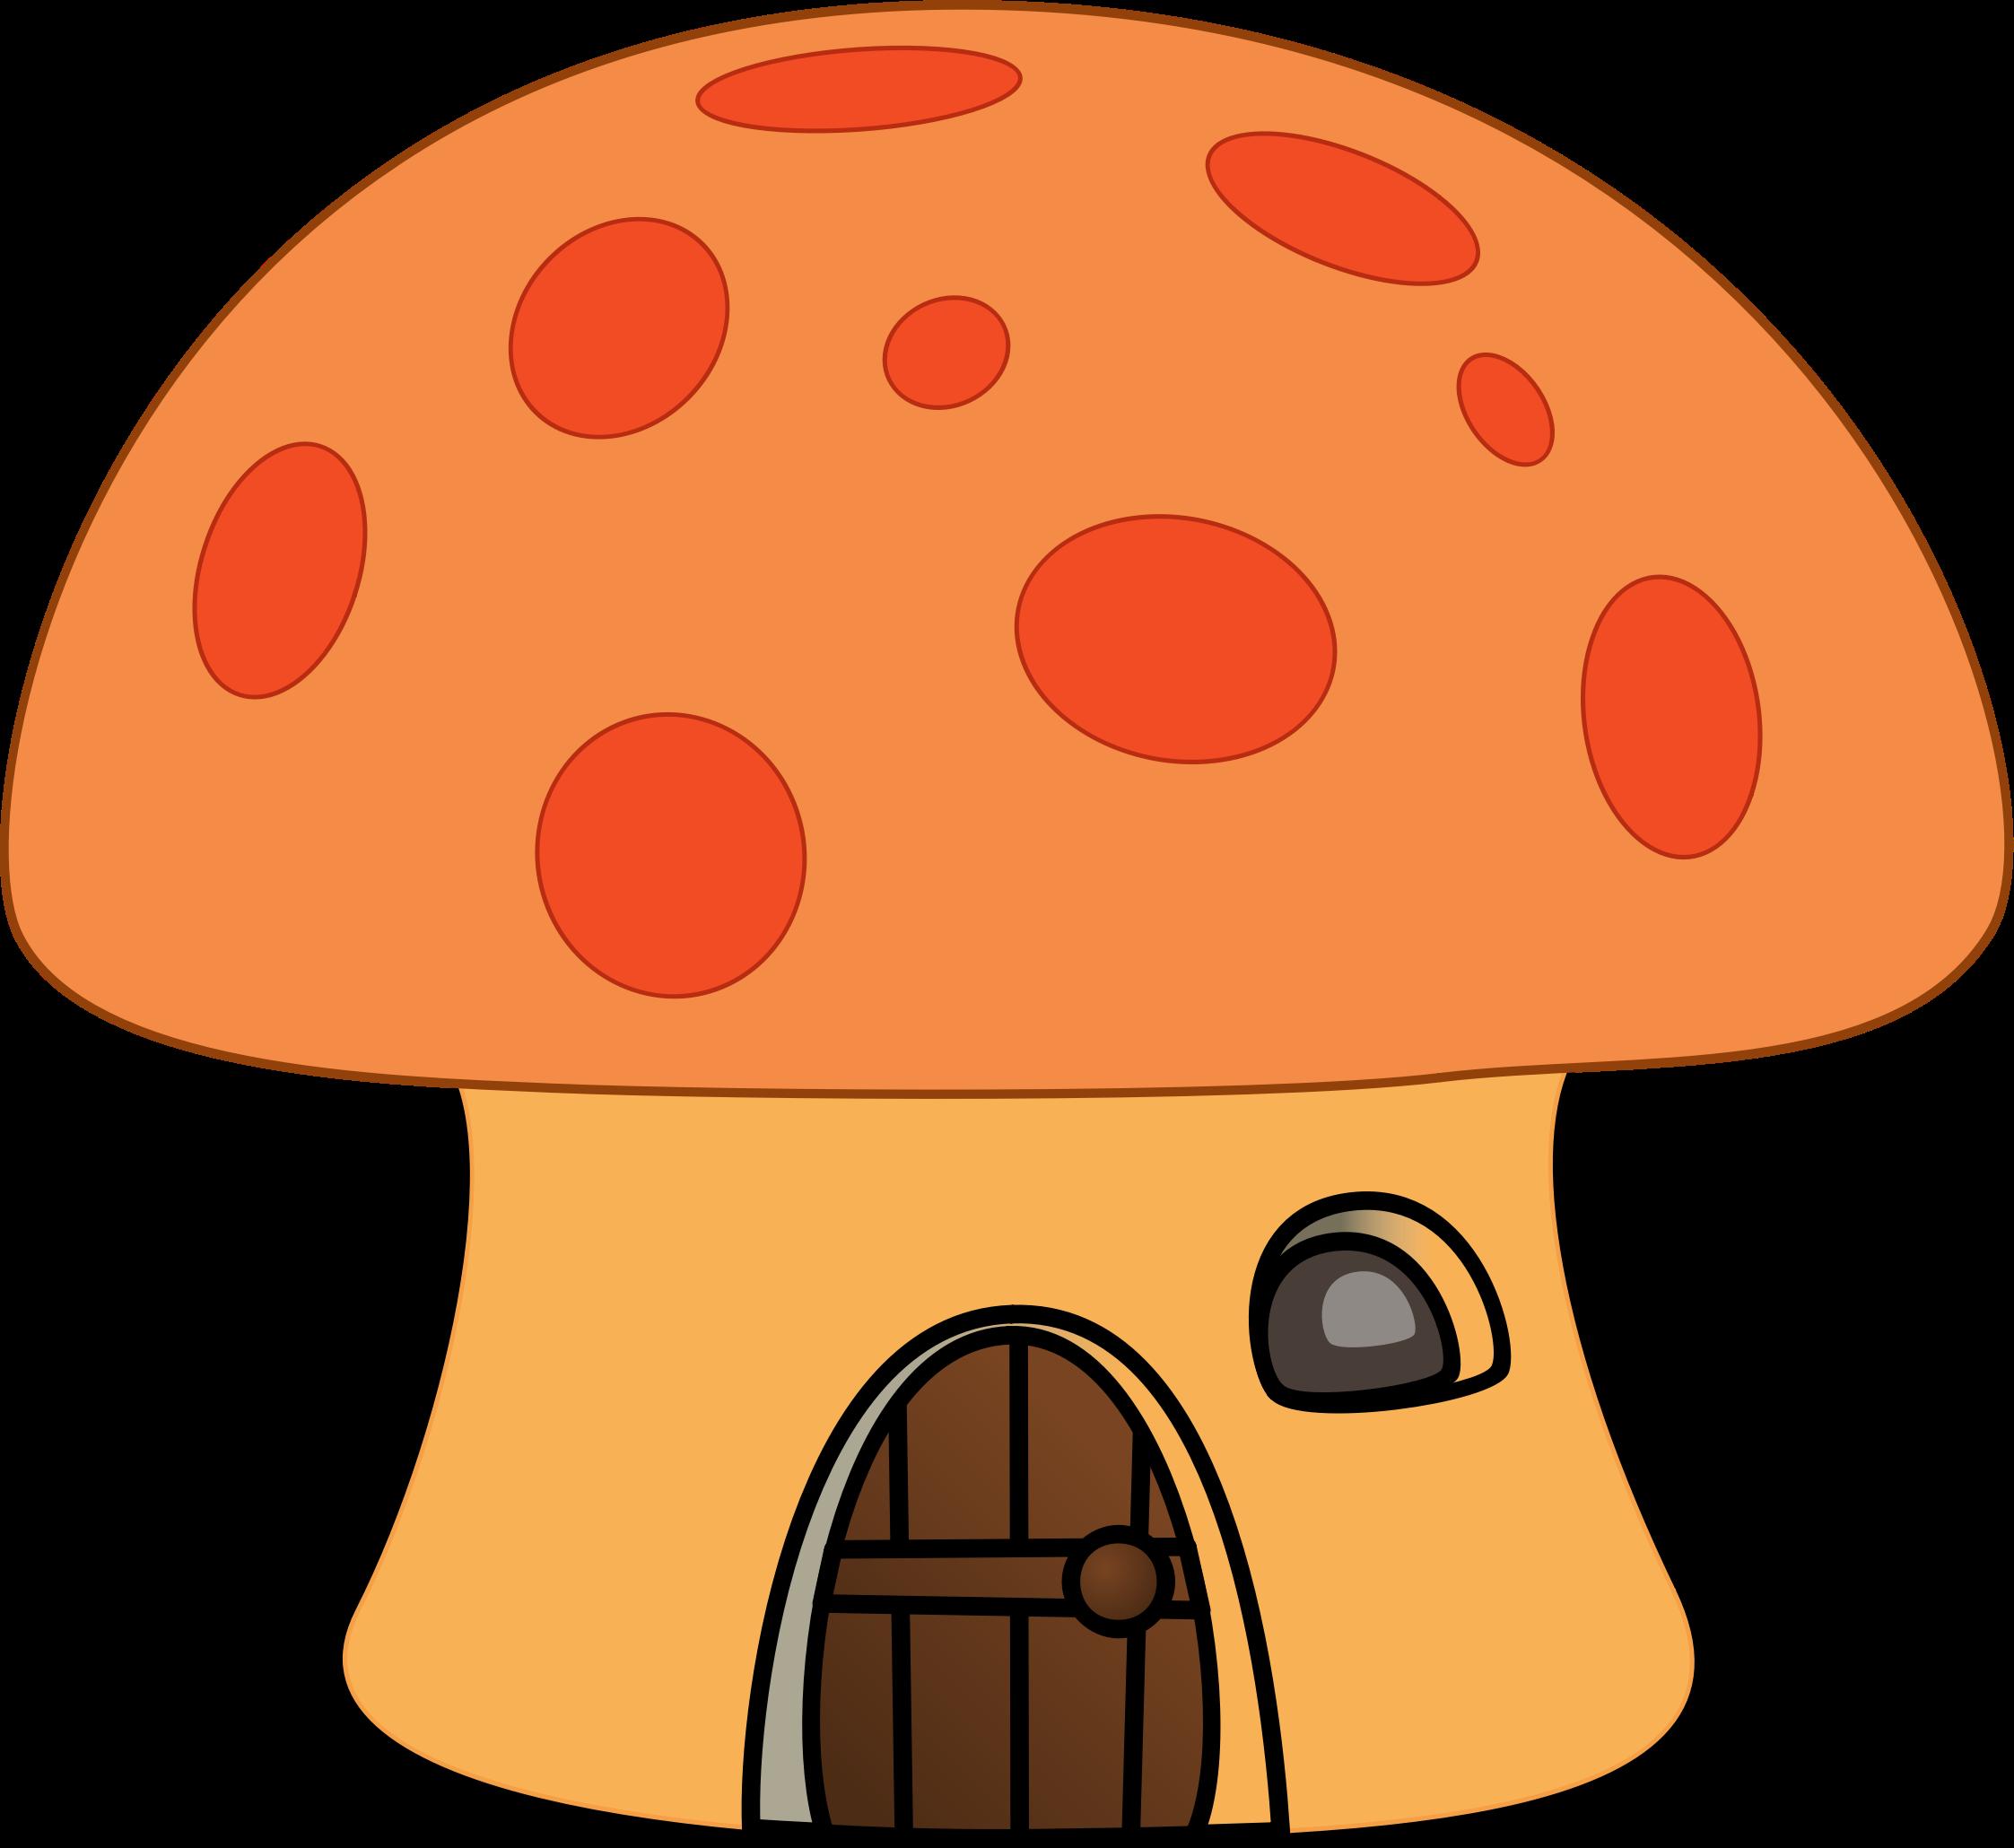 svg black and white Orange mushroom house big. Mushrooms clipart nice.